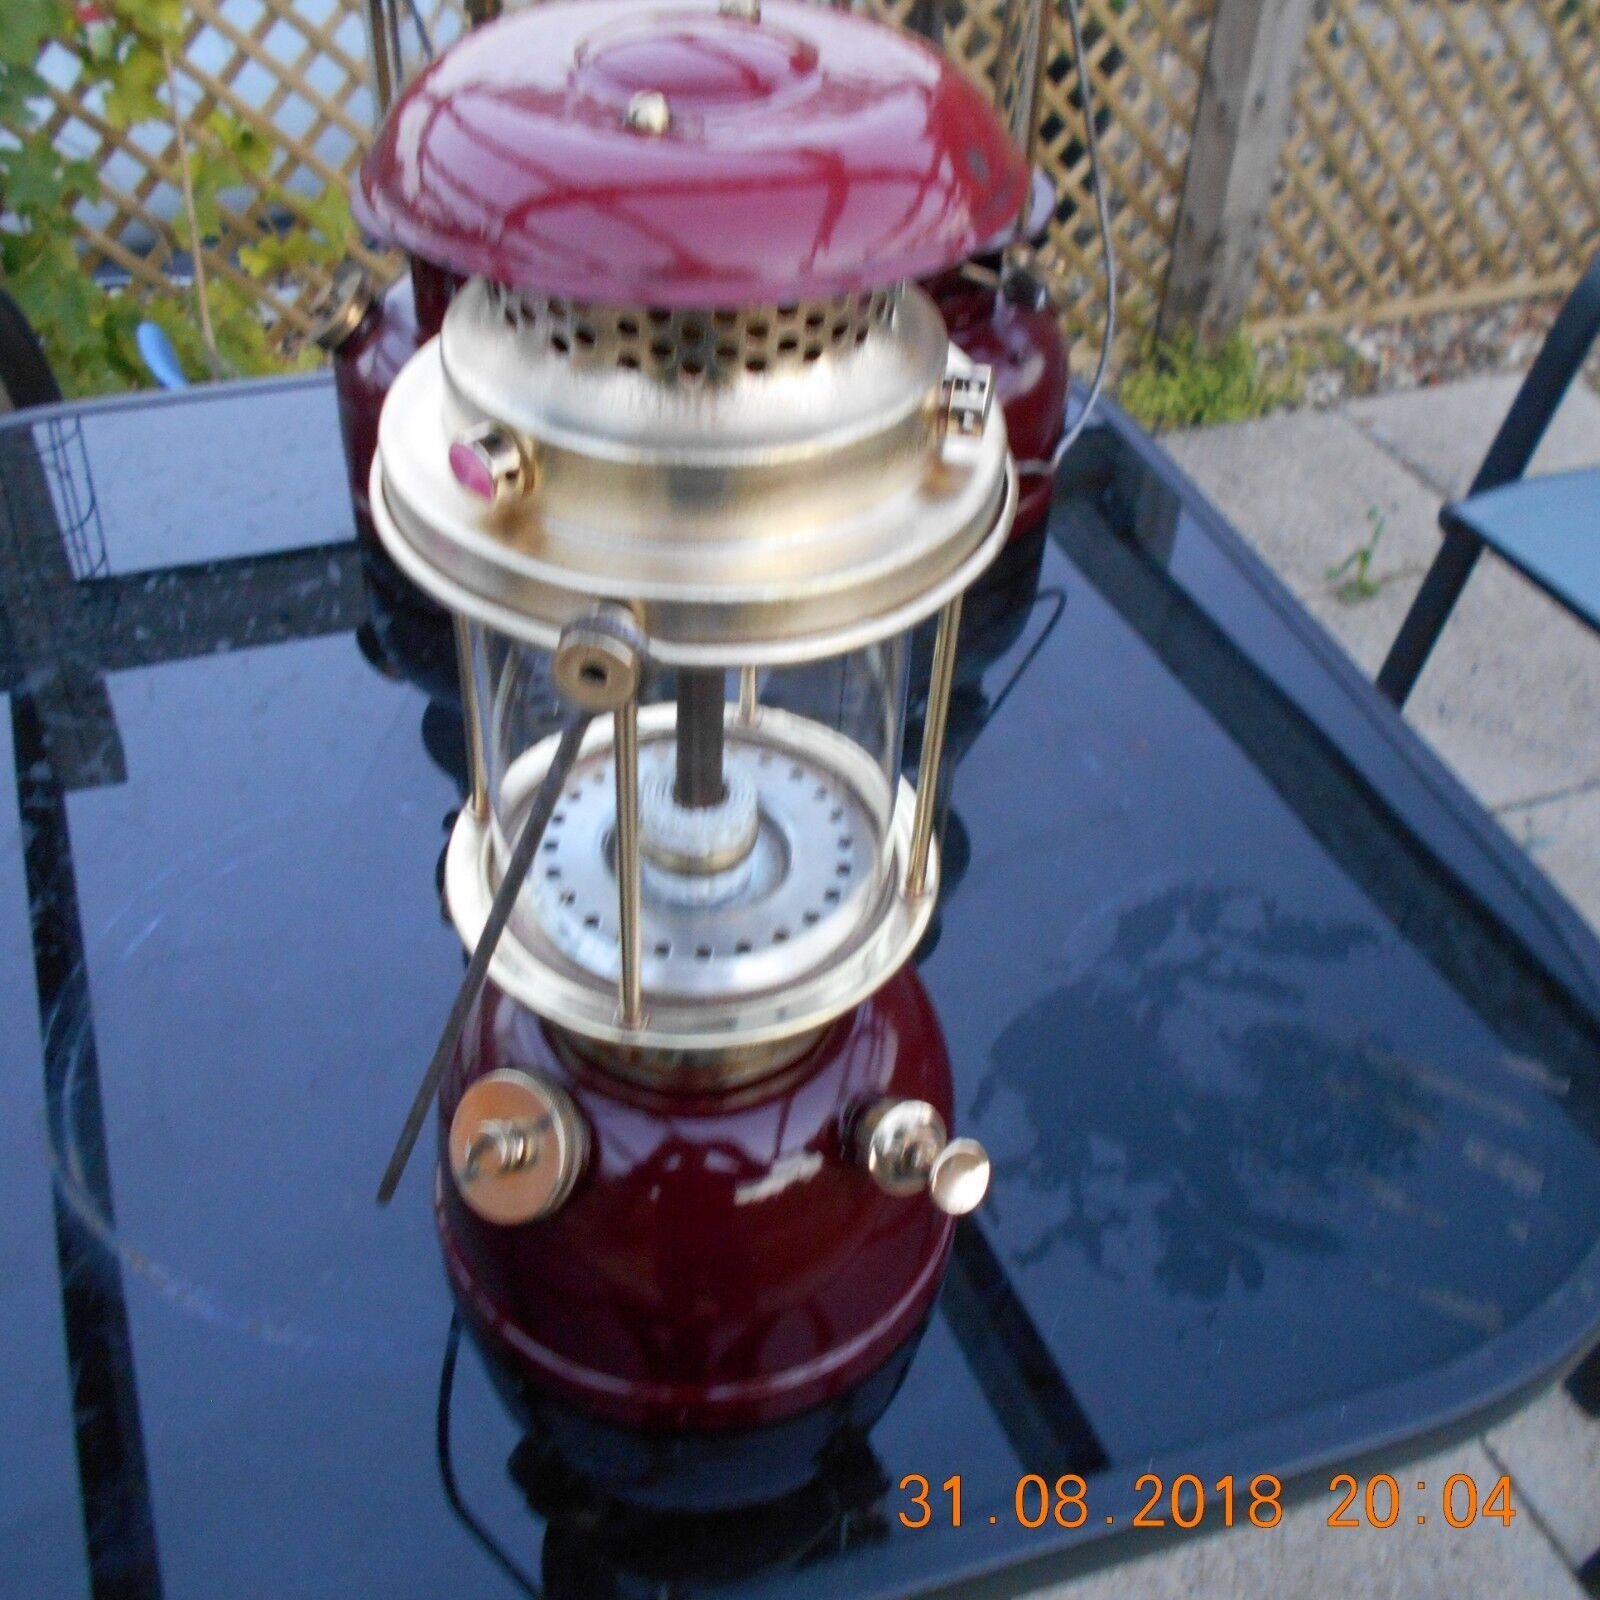 Late 1940s Bialaddin Paraffin 300x Vapalux Paraffin Bialaddin Oil Kerosene Lamp Antique Lantern d3bf7d